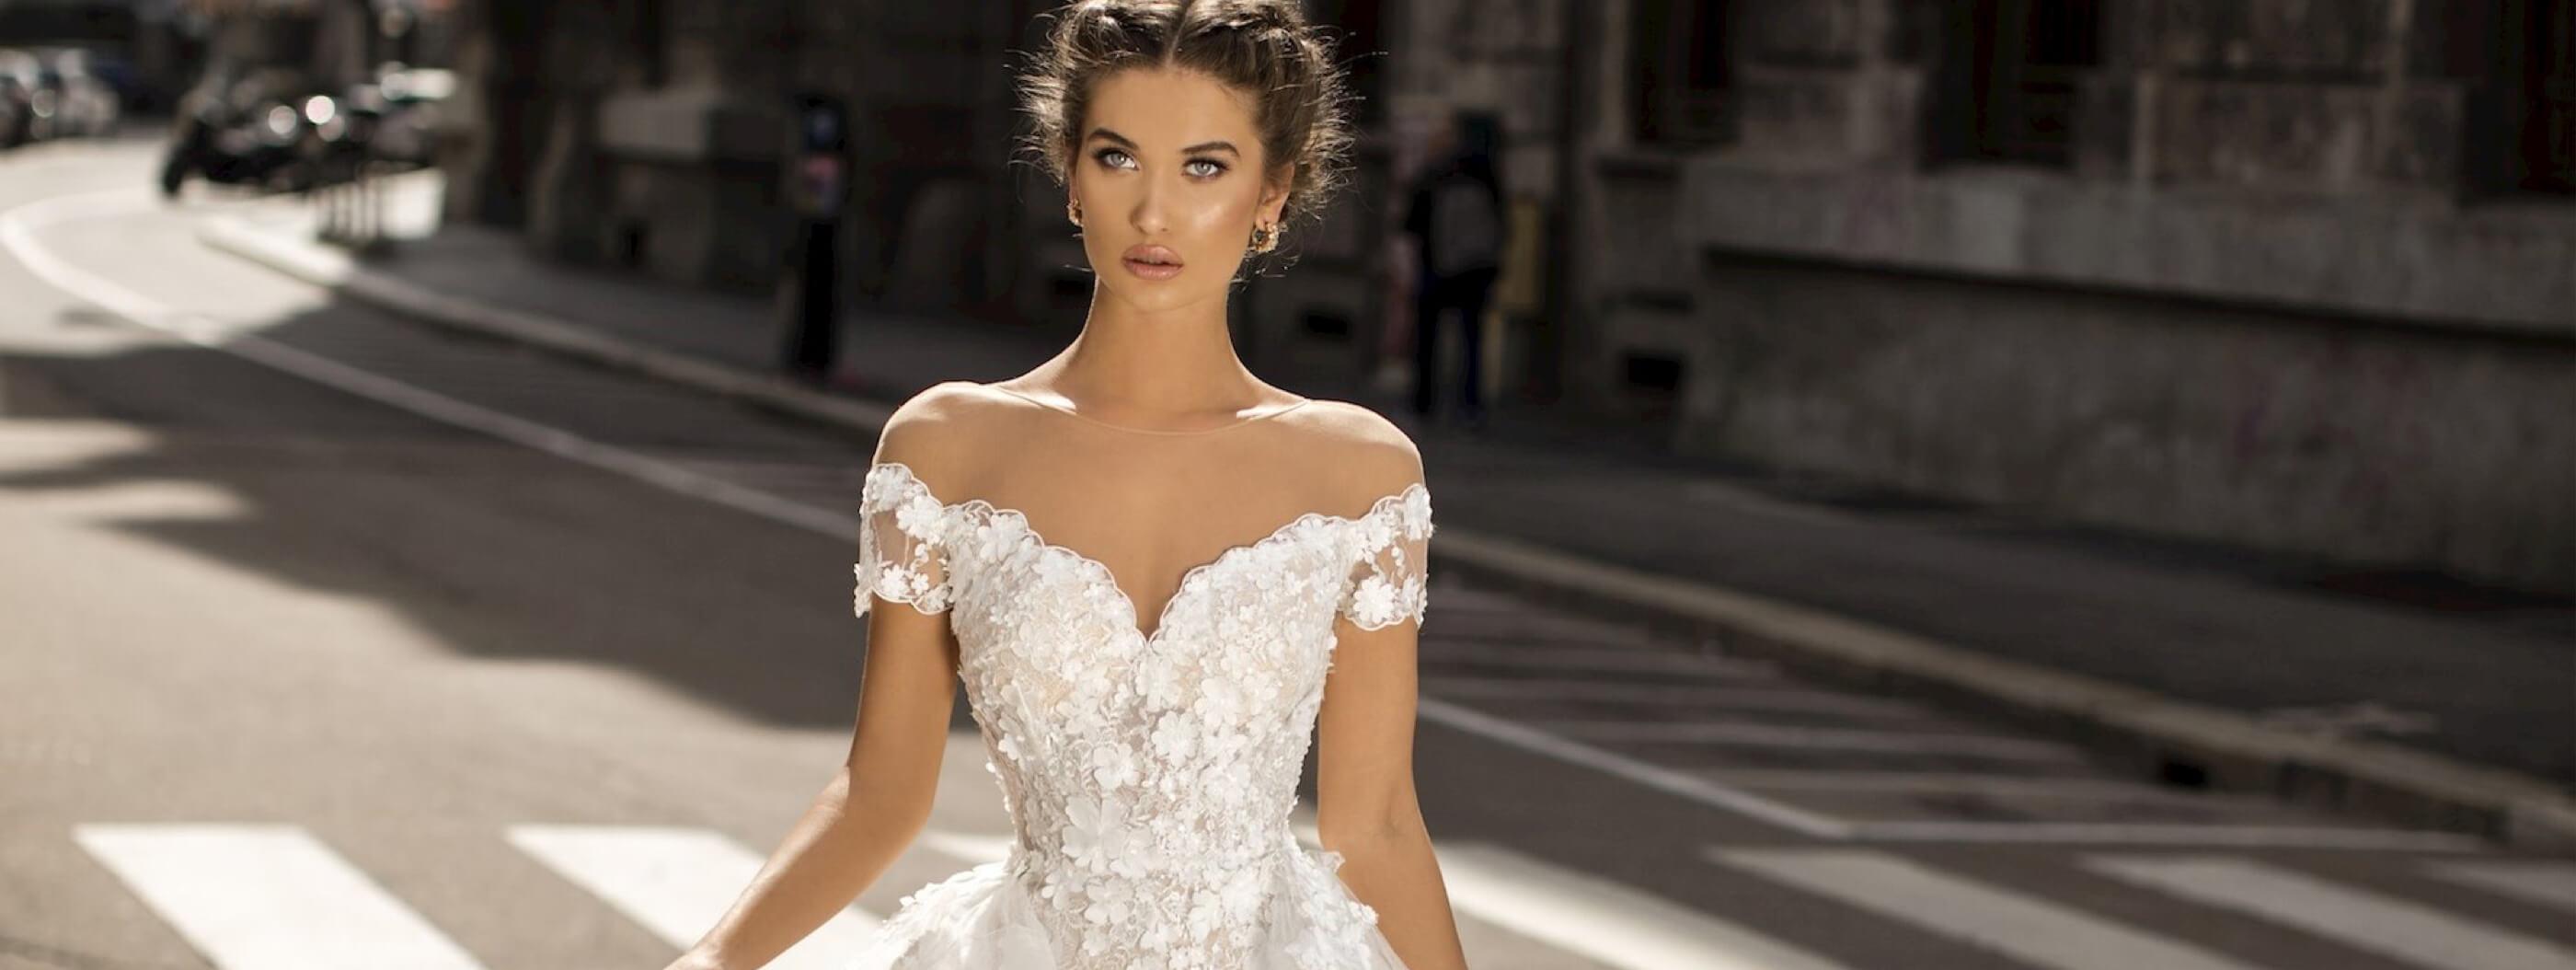 Bridal Dresses Rental Toronto Goldin Ma,Fancy Ladies Dresses For Weddings